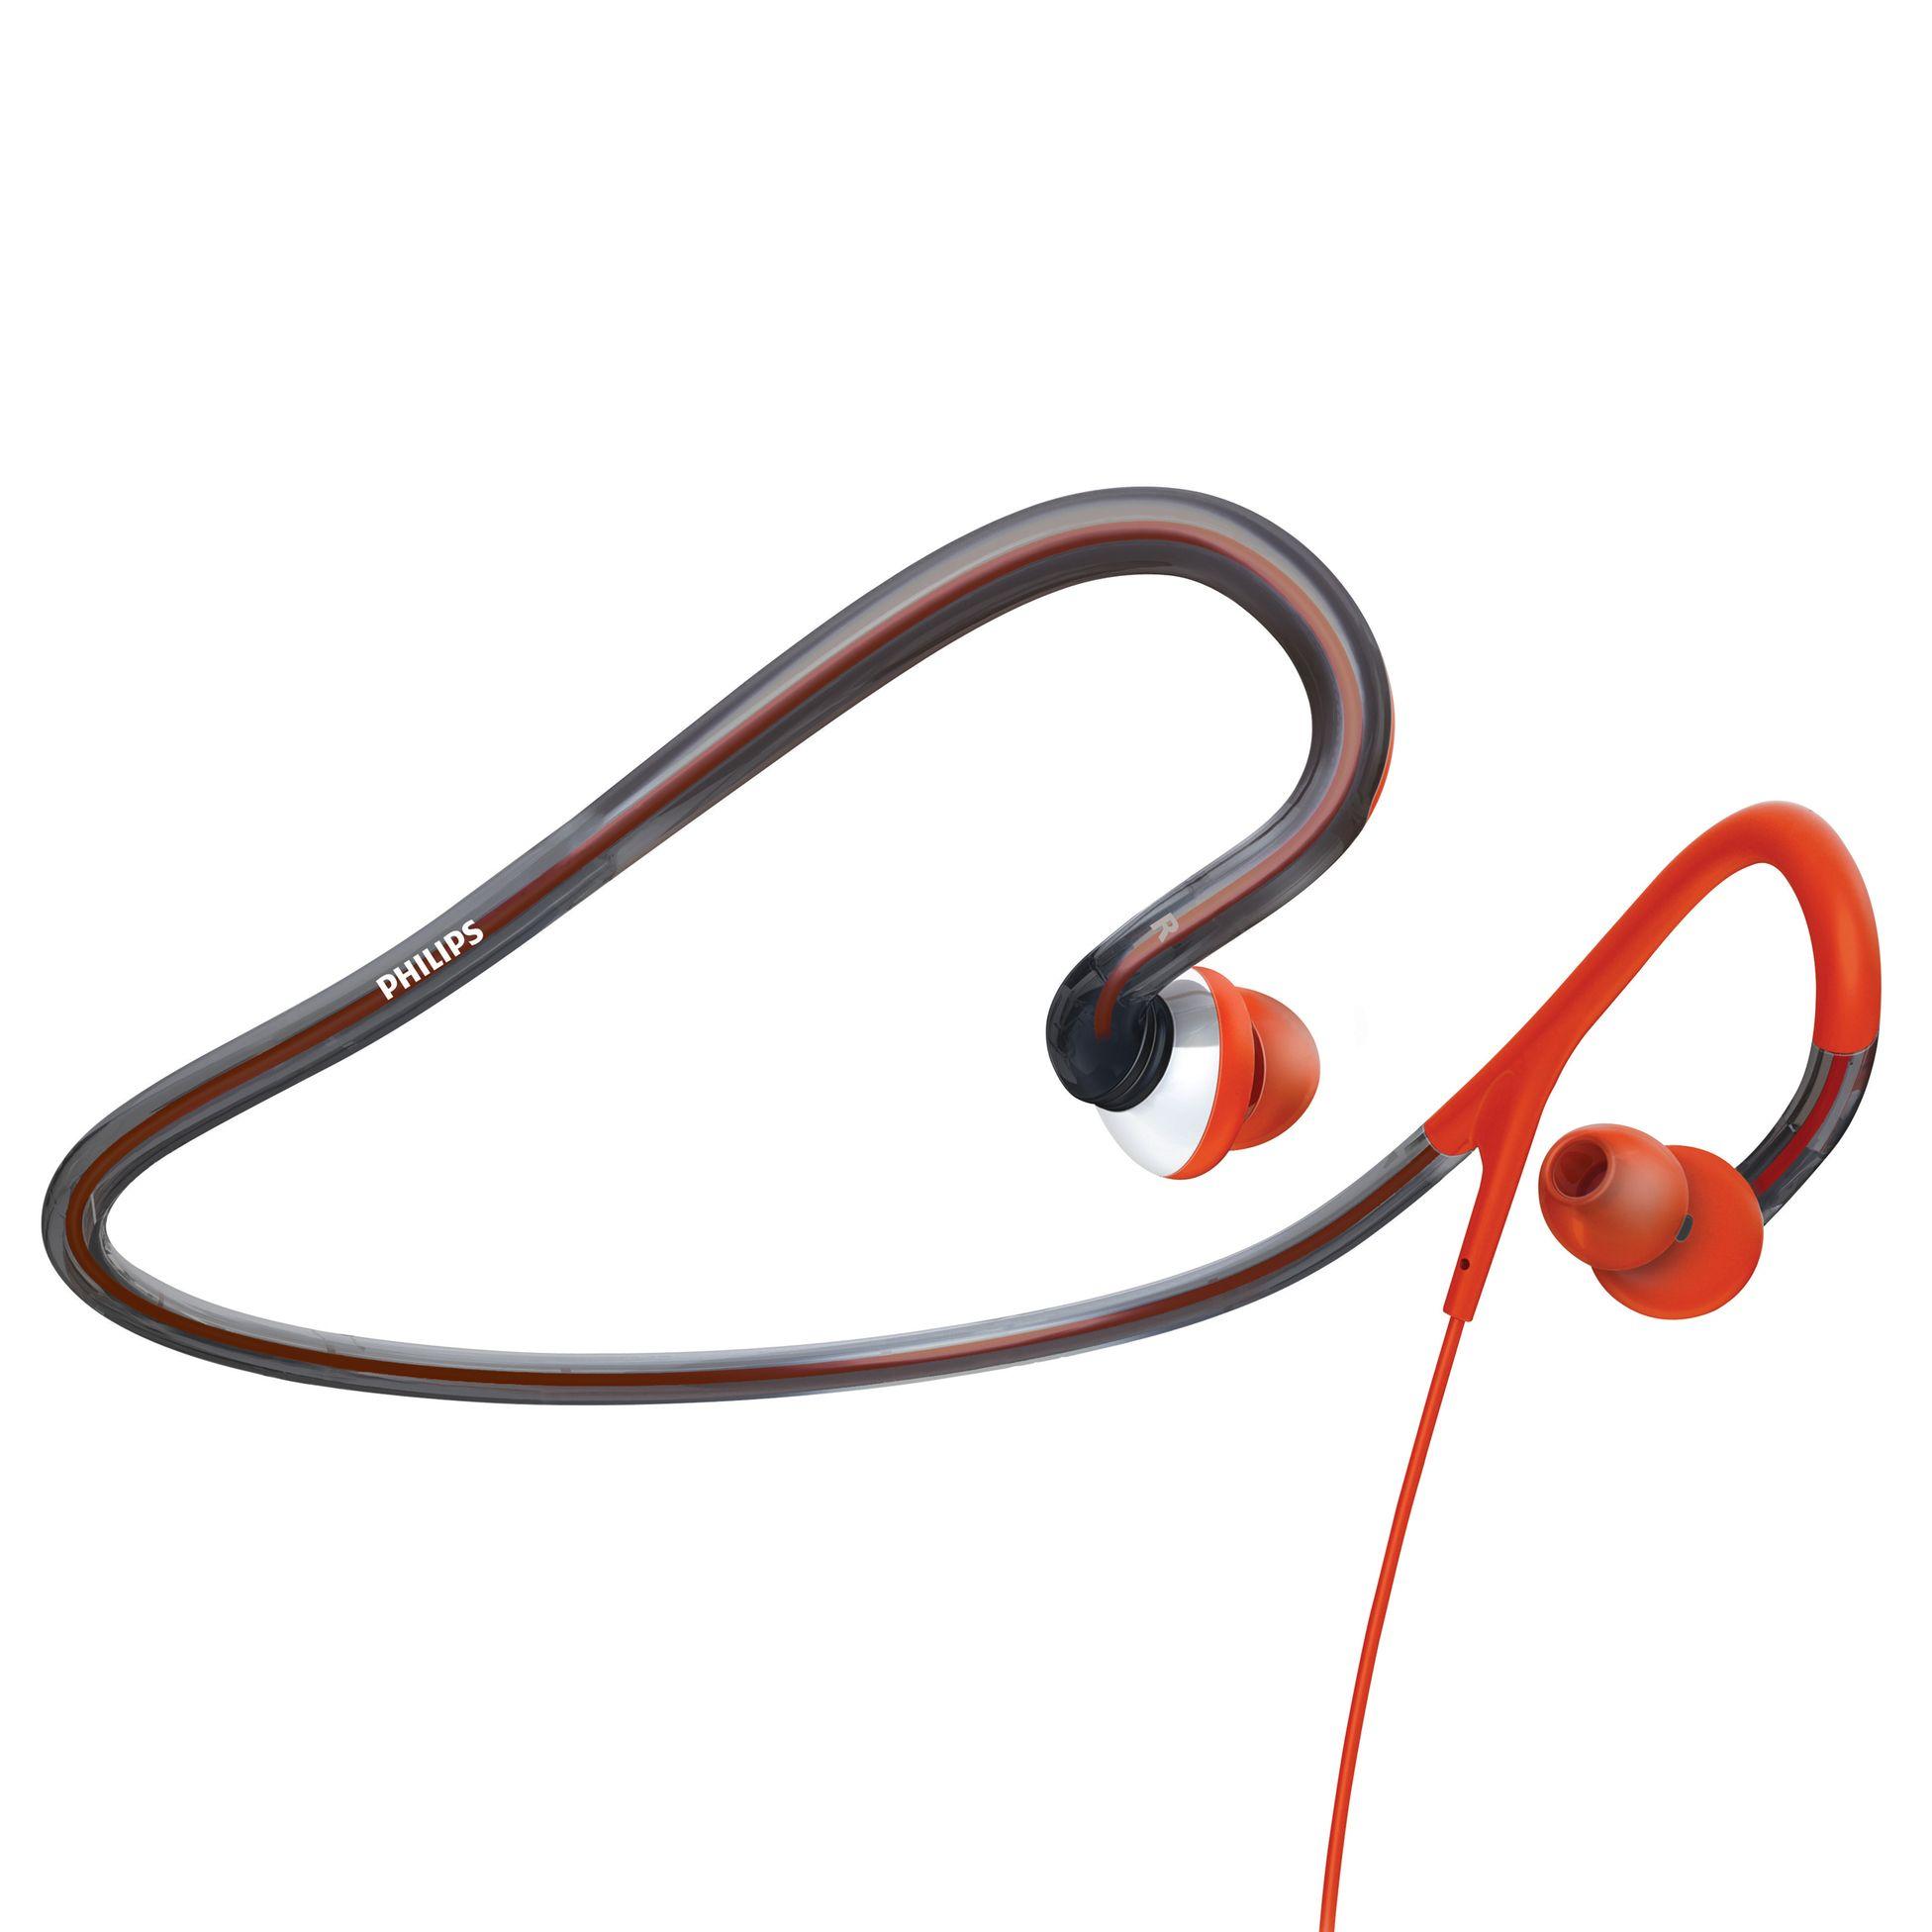 Philips Shq4000 10 Headphones Philips Shq4000 10 Around Ear